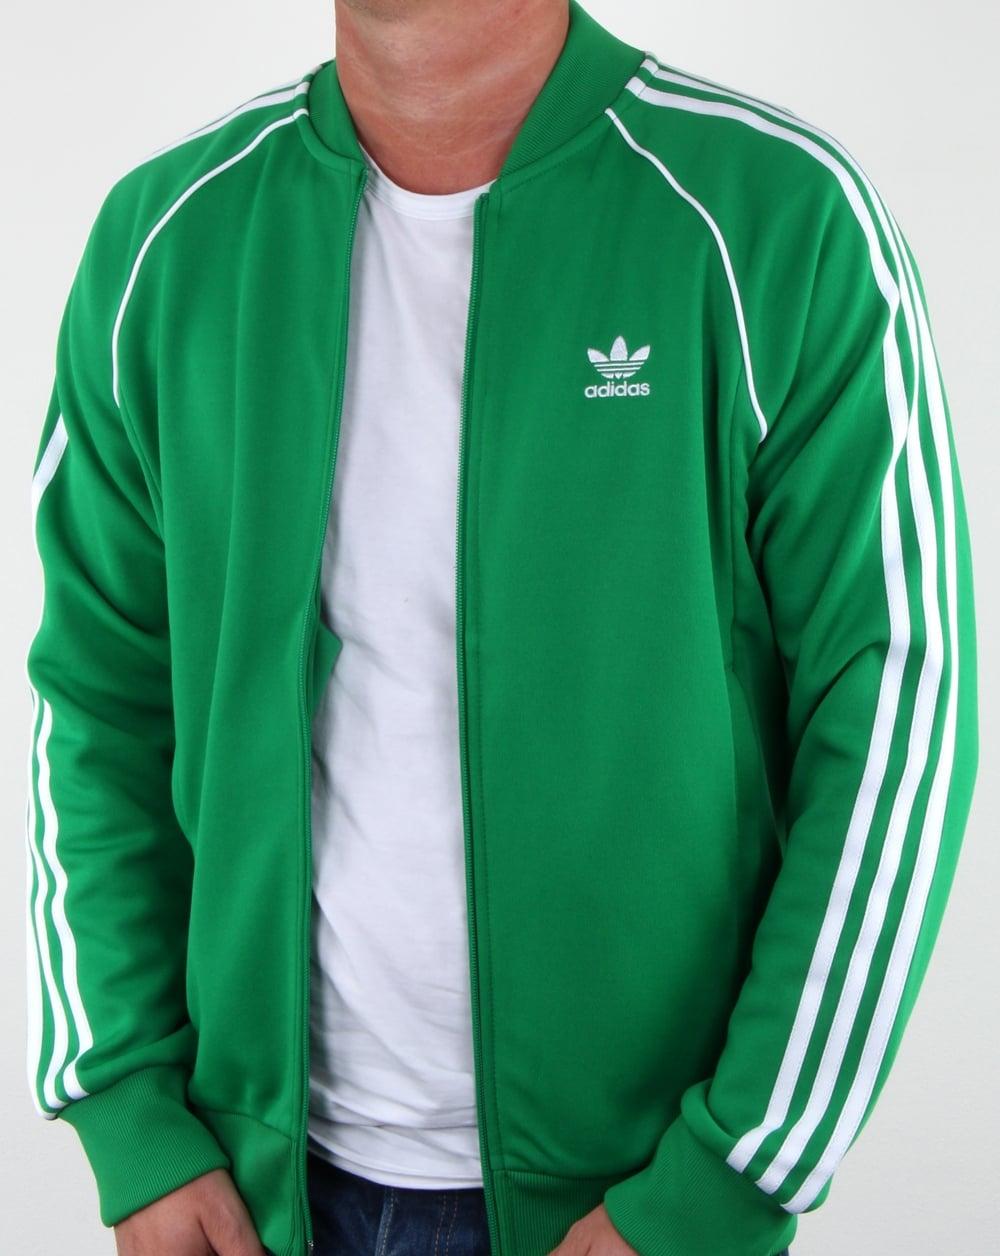 b1b1b8ca054 Adidas Originals Superstar Track Top Green